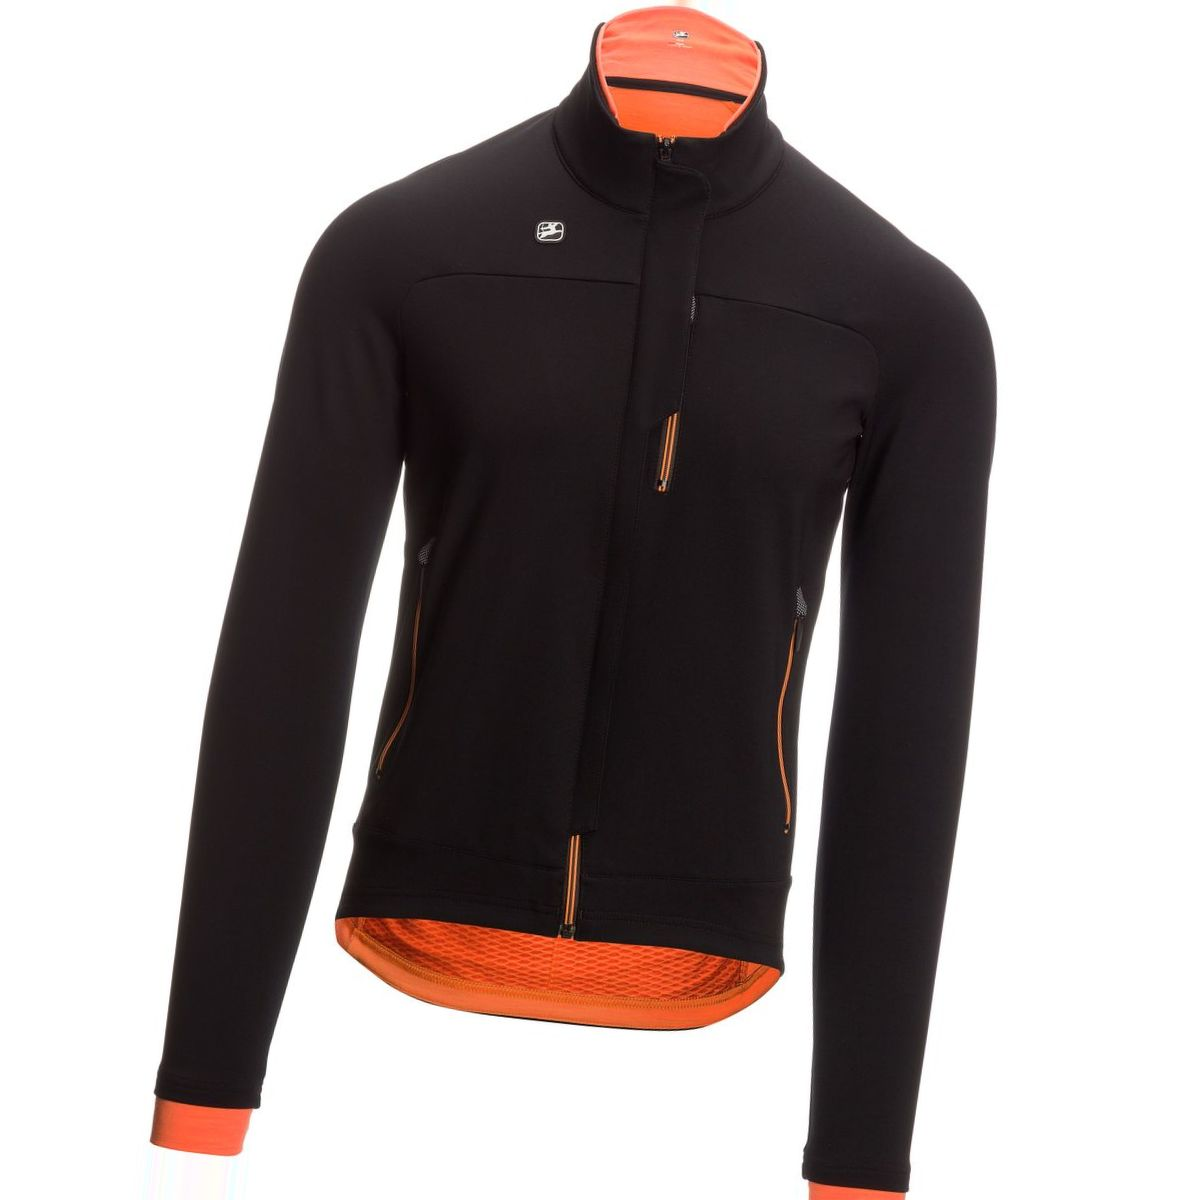 Giordana Sosta Winter Jacket - Men's